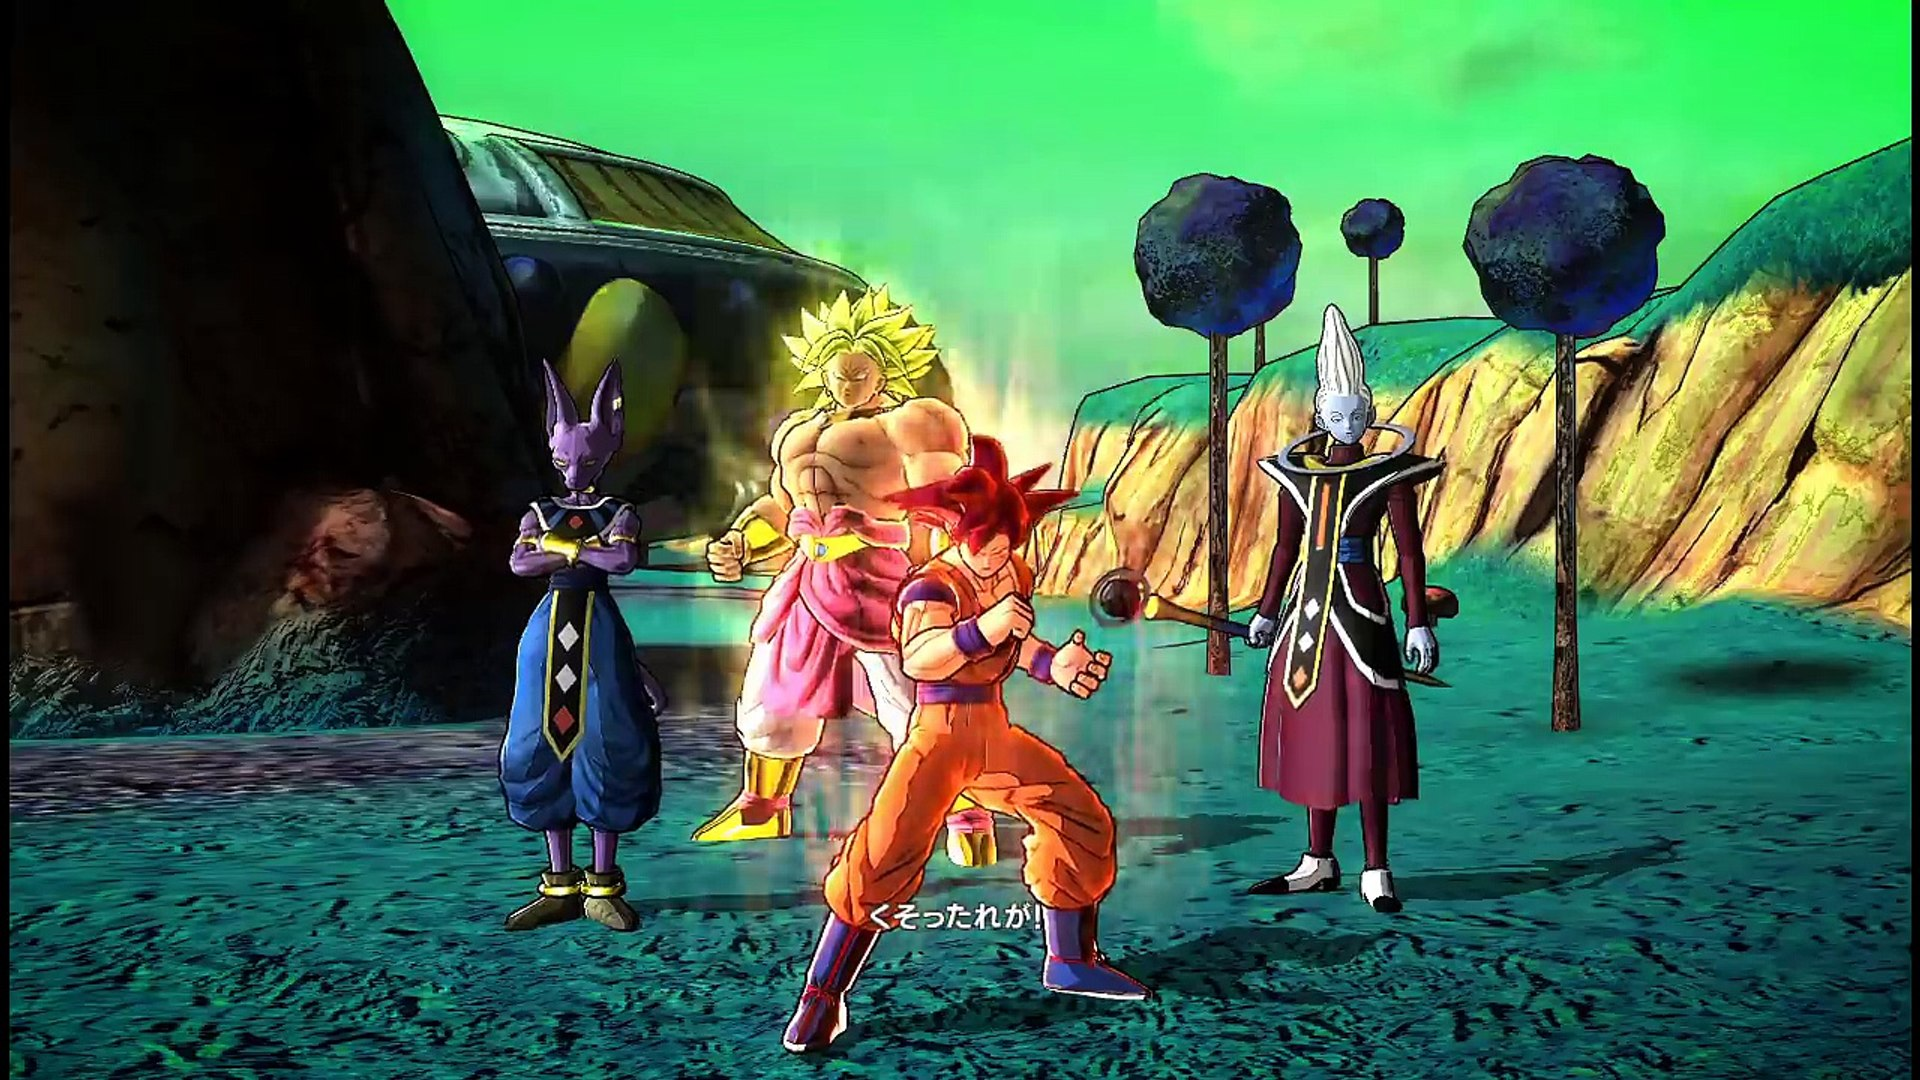 Super Saiyan God Goku Vs Legendary Super Saiyan Broly Dragon